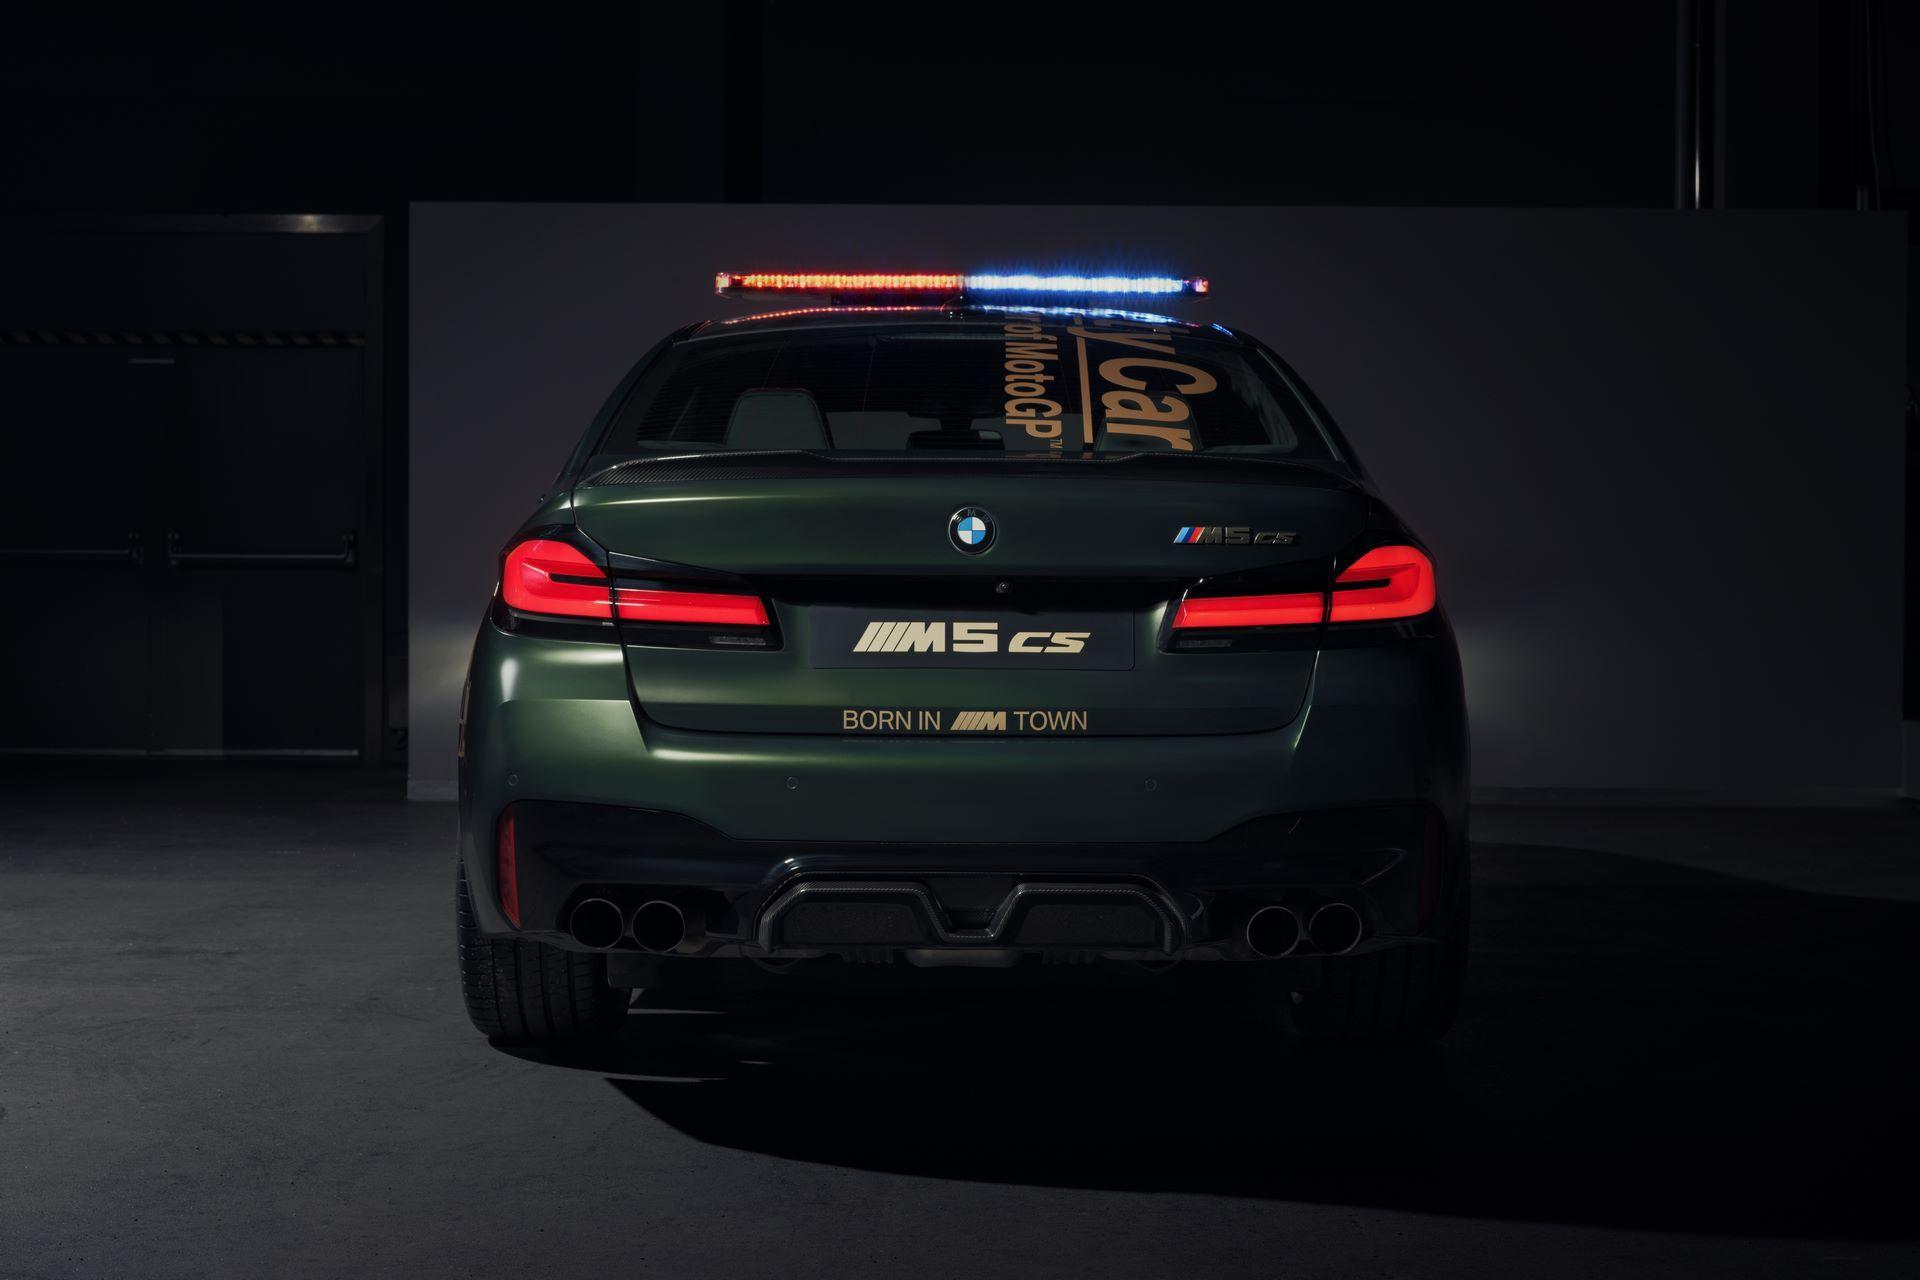 BMW-M3-M4-M5-CS-Safety-Cars-moto-gp-motogp-15